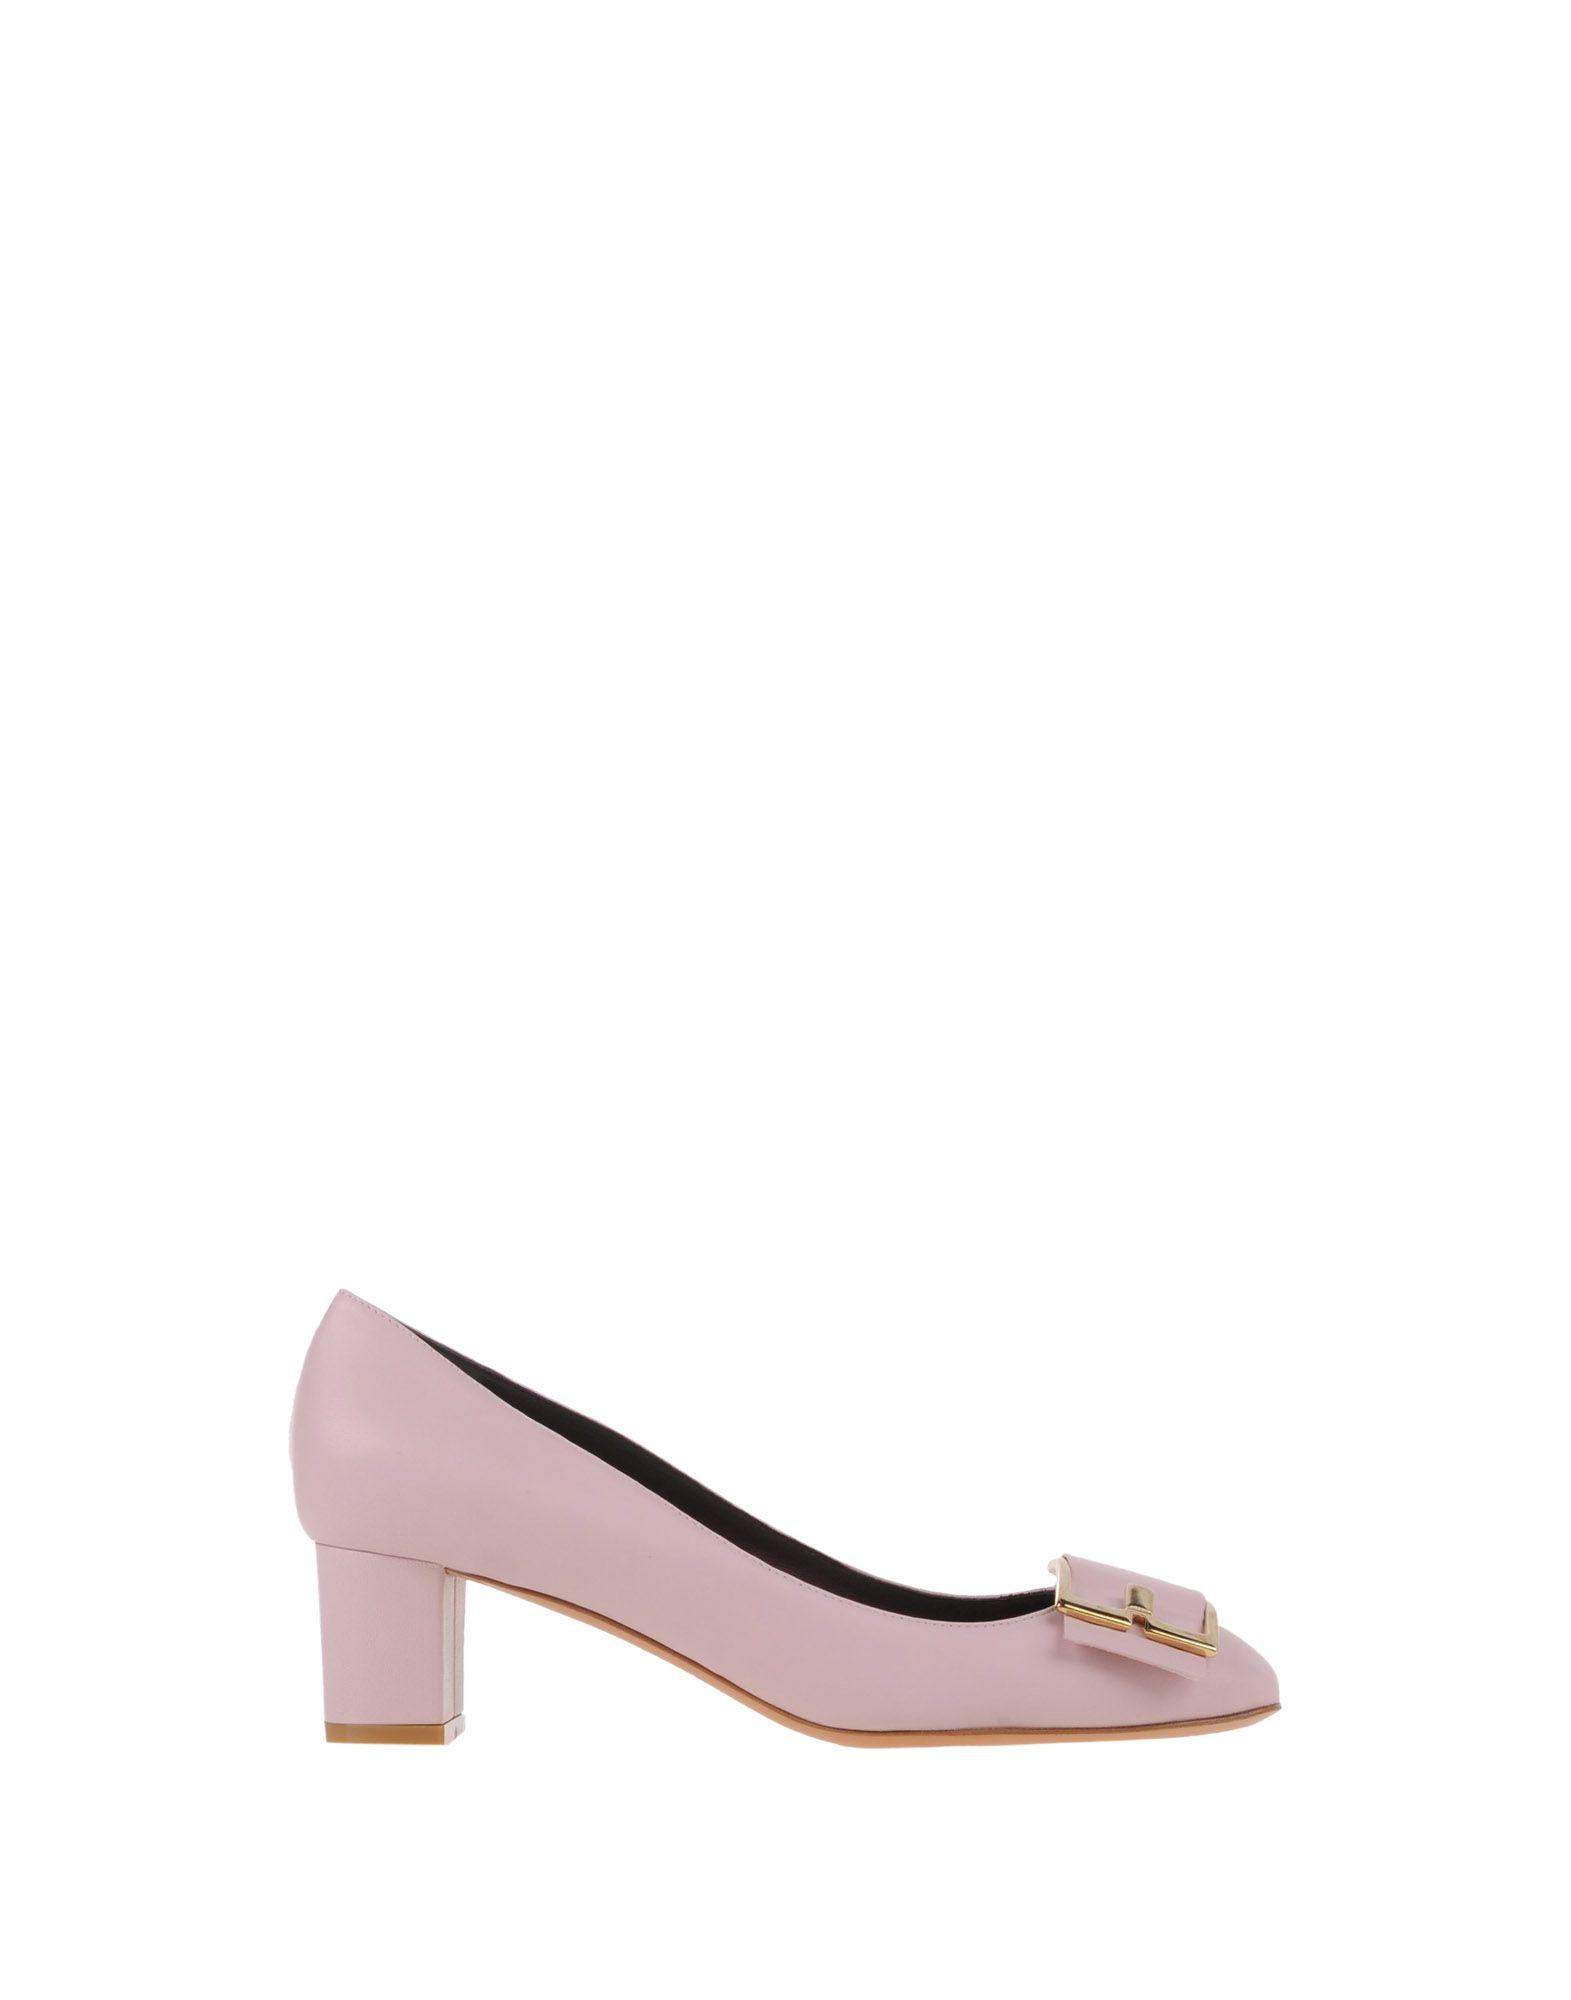 Bruno Magli Womens Shoes Uk